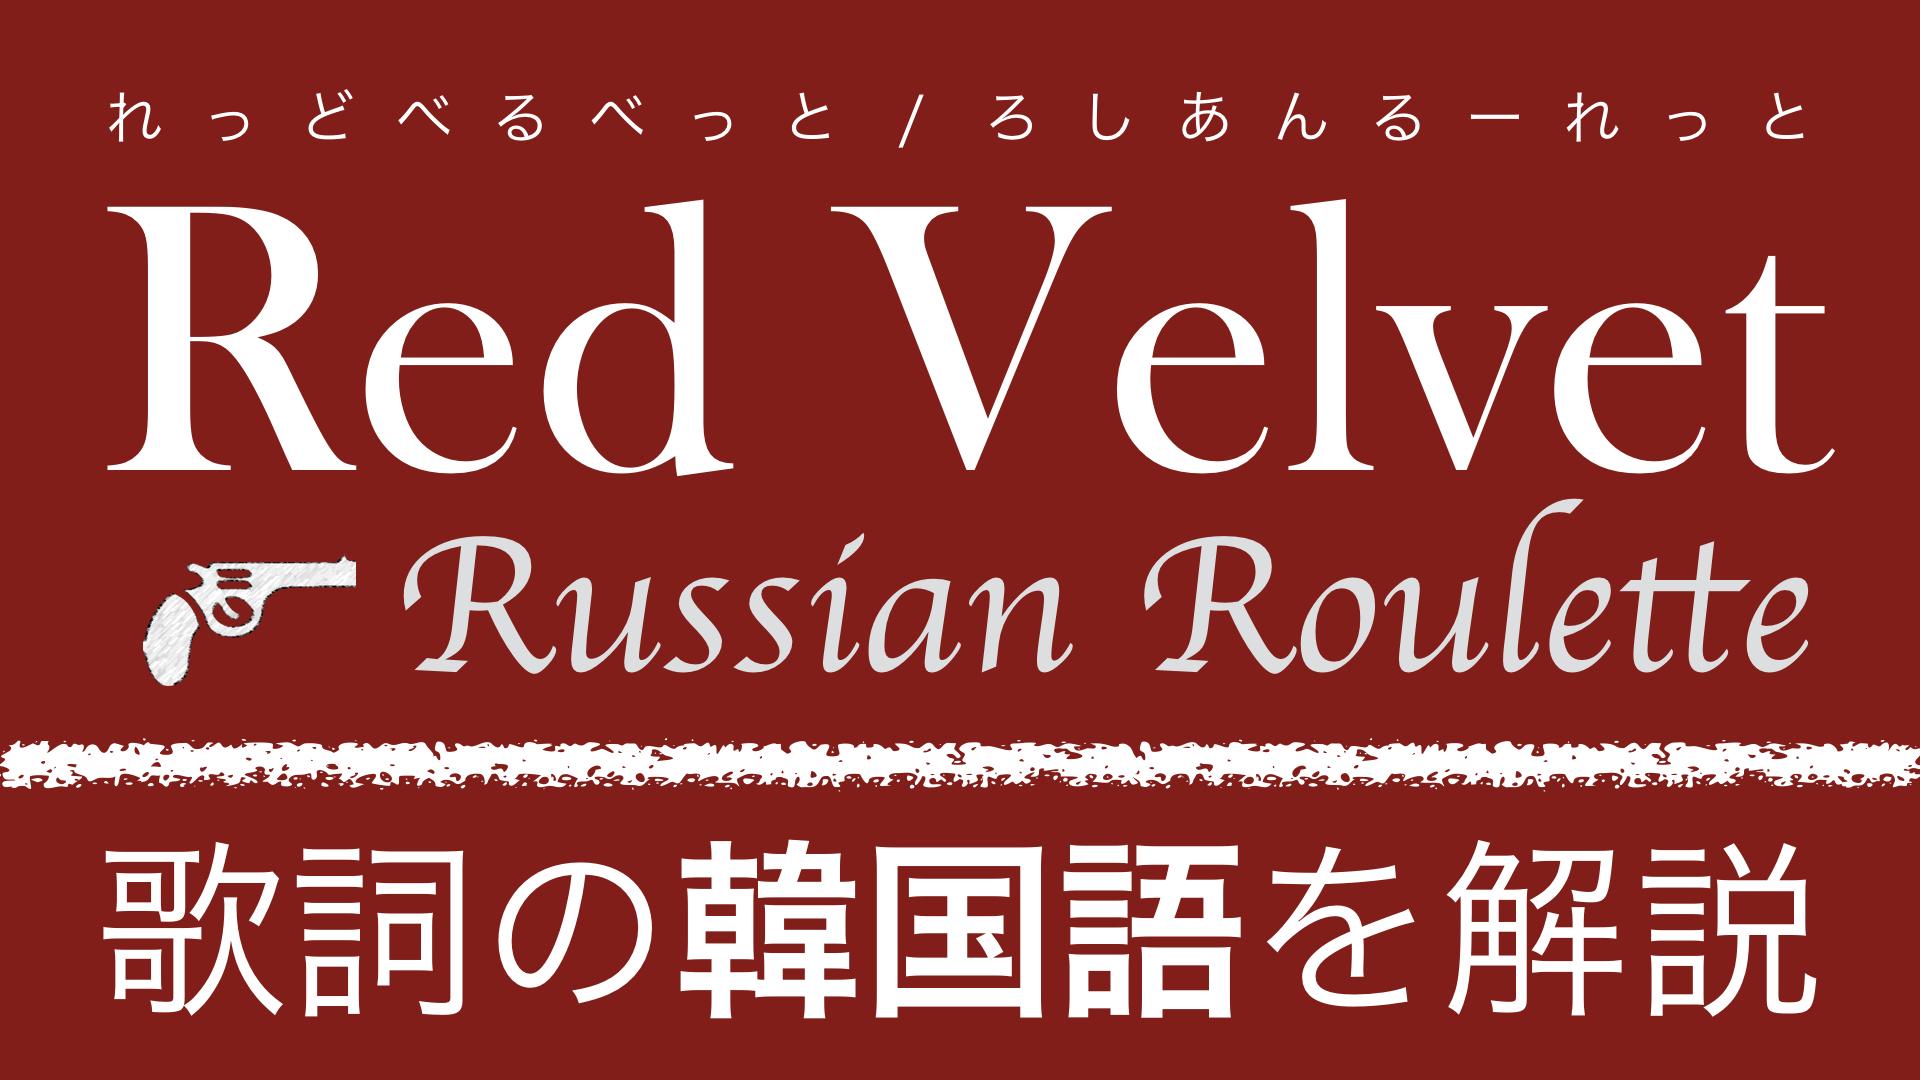 【K-POPで学ぶ韓国語】Russian Roulette(ロシアンルーレット)/Red Velvet(レッドベルベット)の歌詞を日本語で詳しく解説!